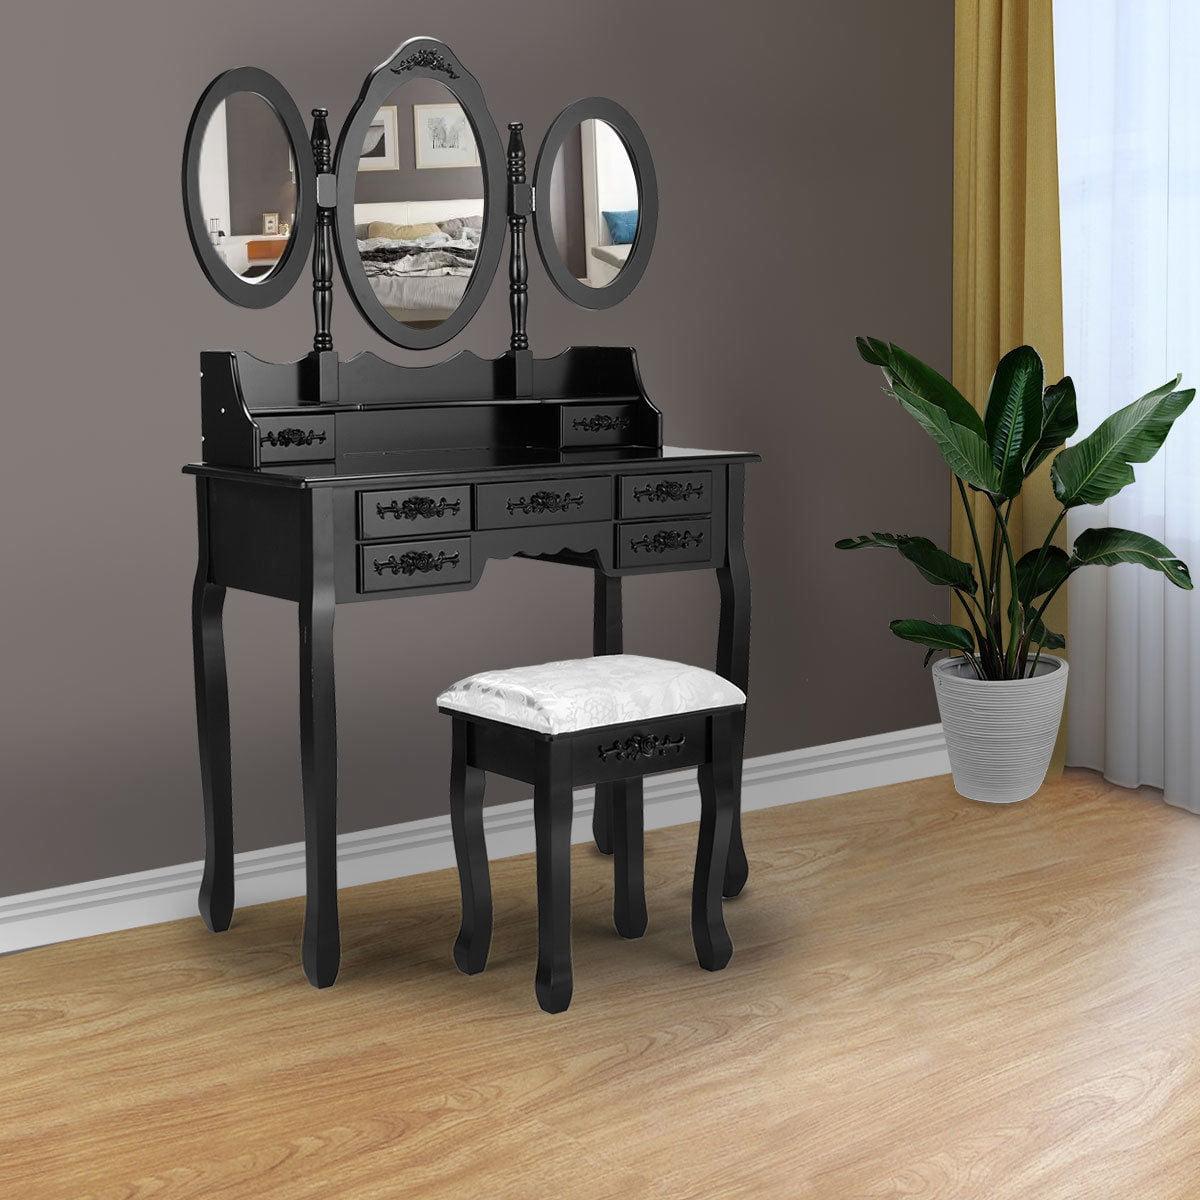 extraordinary black bedroom vanity   Topcobe Makeup Vanity Set with Drawers, Vanity Table with ...